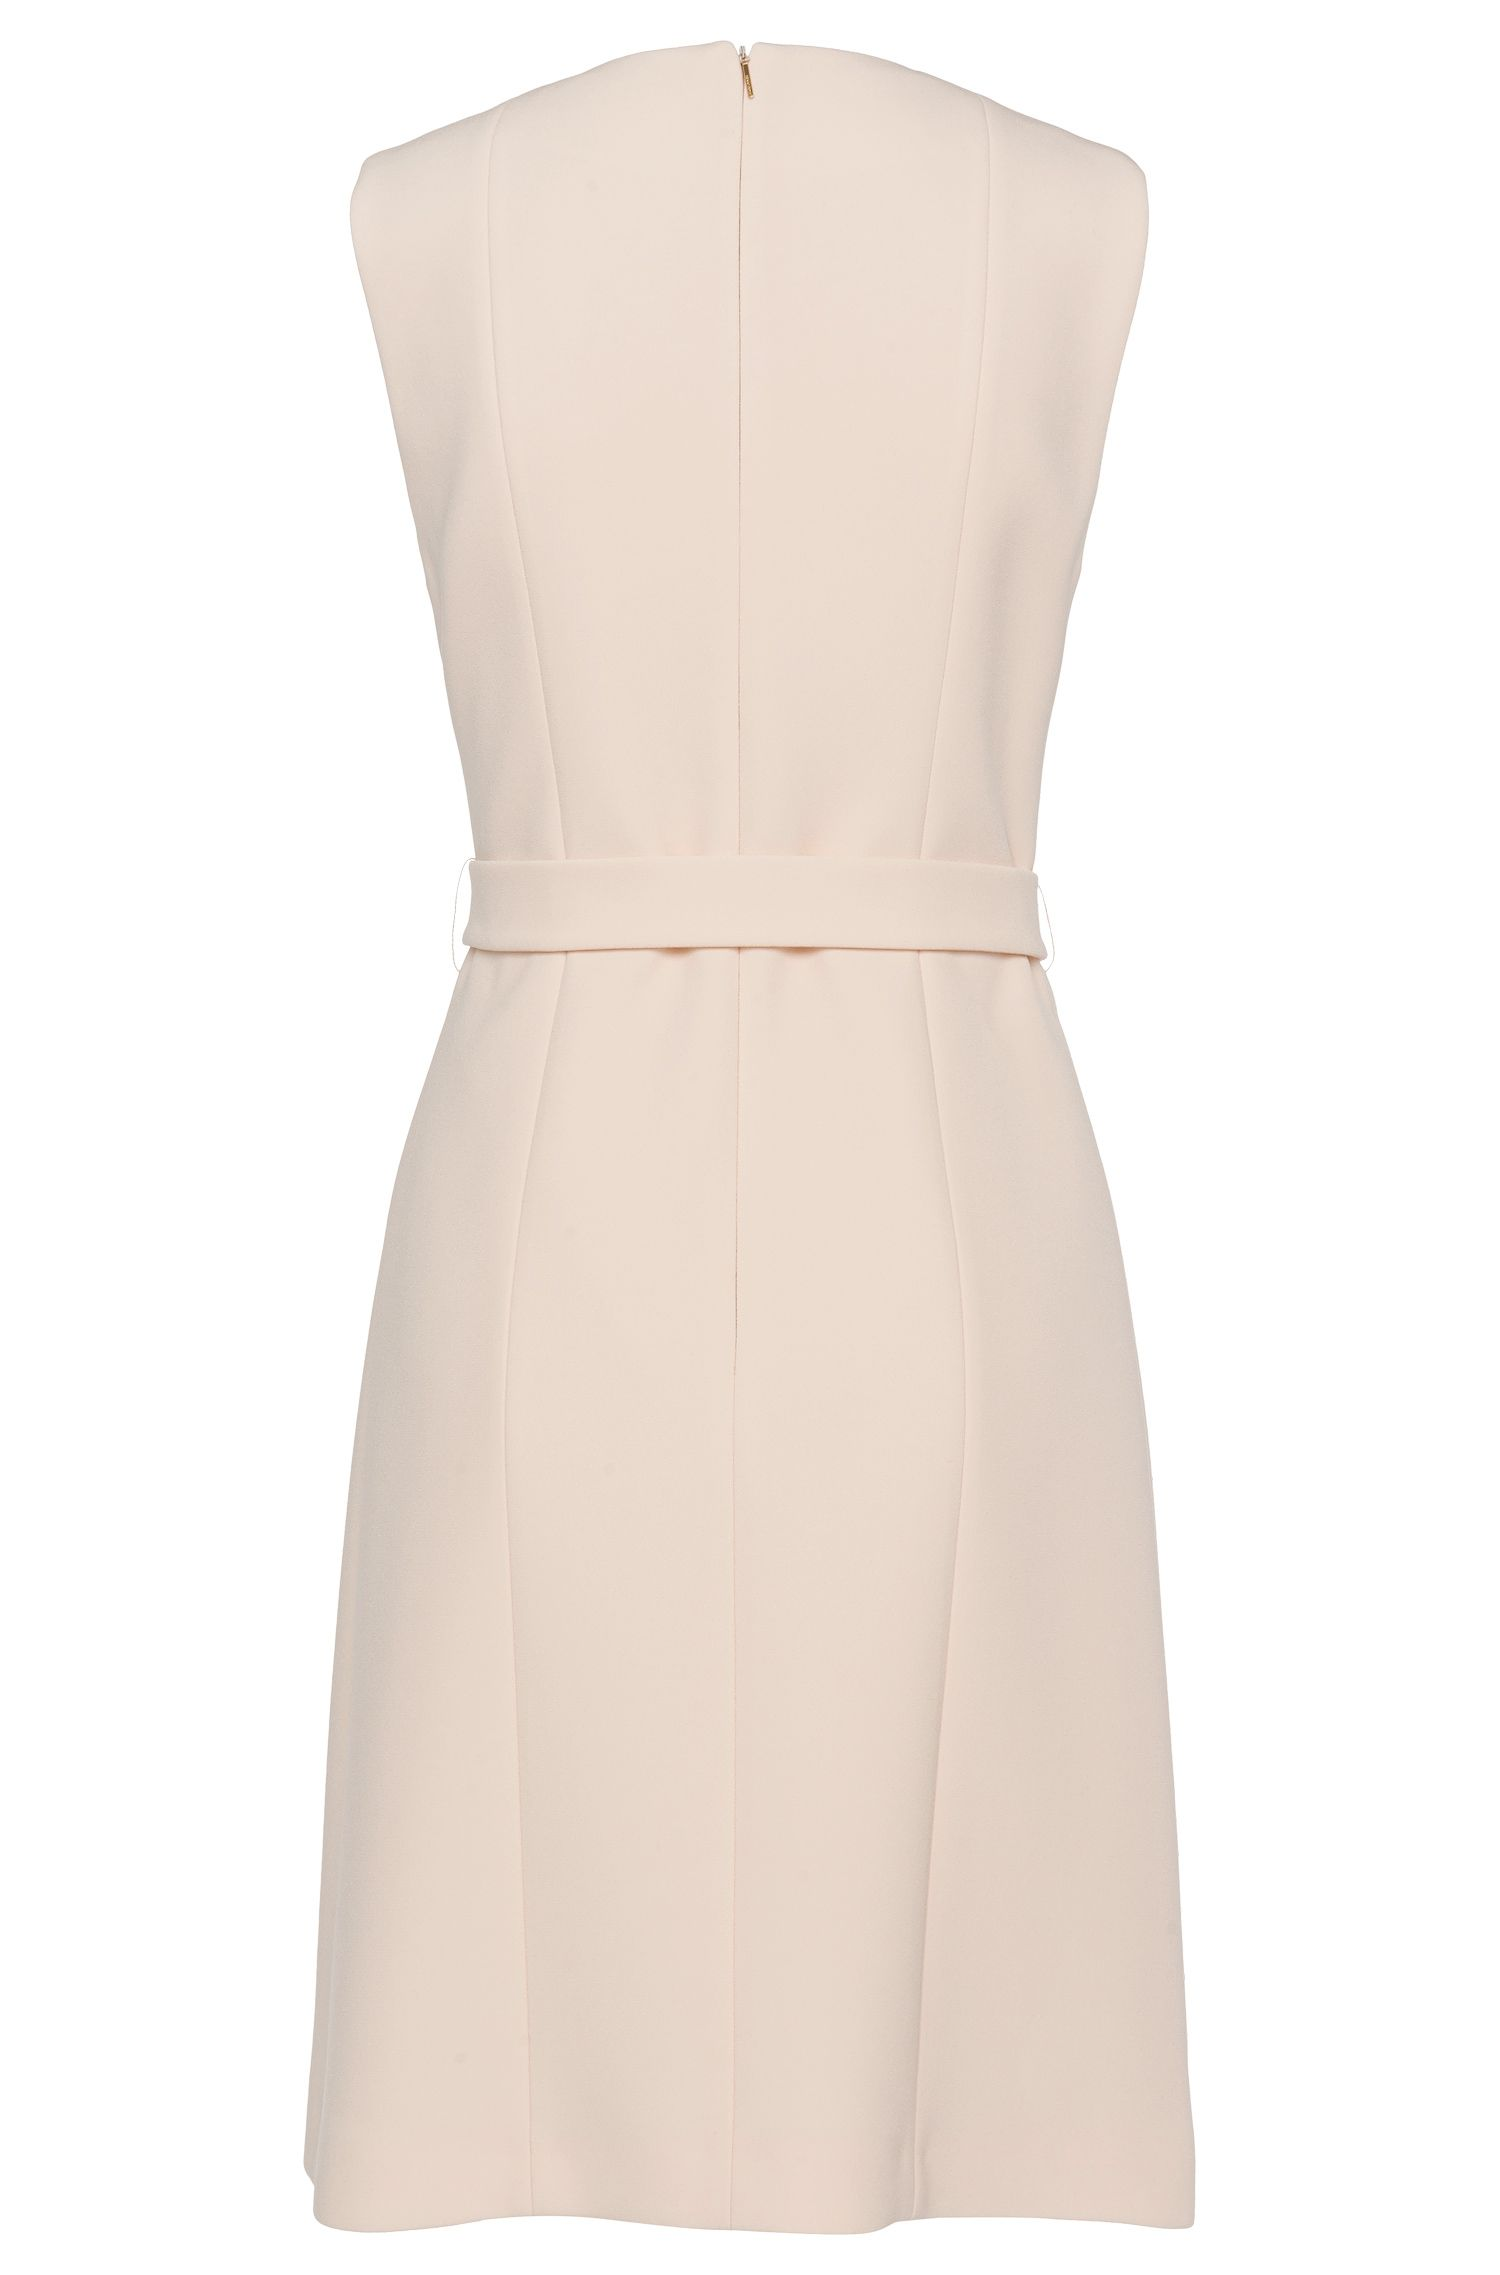 Mouwloze jurk met tailleceintuur: 'Diganira'